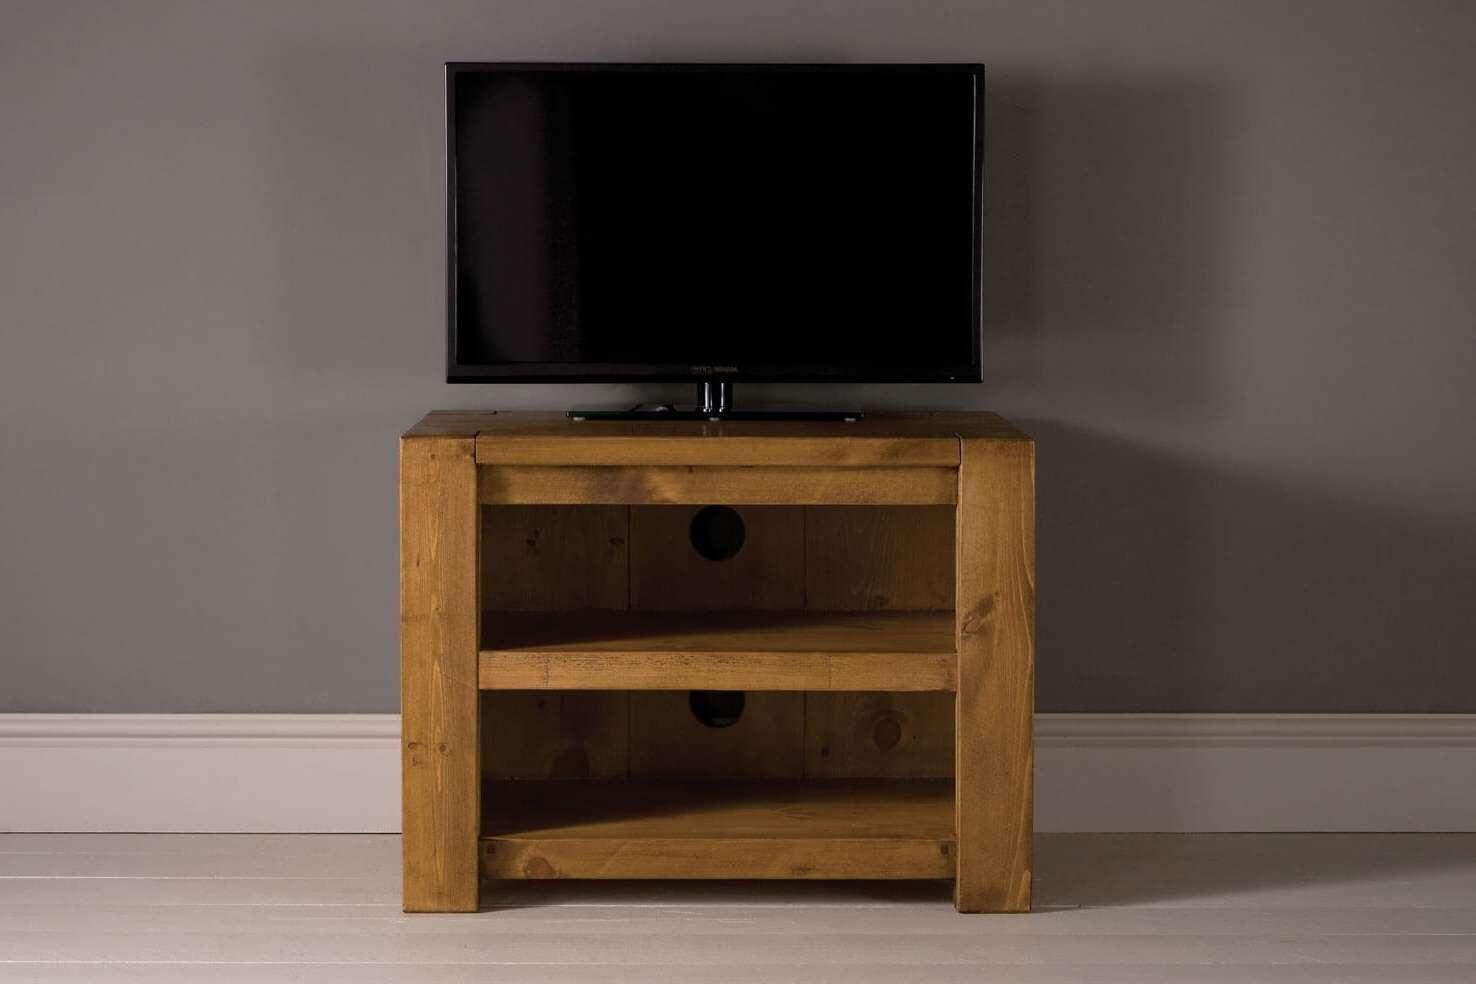 Midi Plank Beam Tv Cabinet With Shelfindigo Furniture Inside Small Tv Cabinets (View 5 of 20)